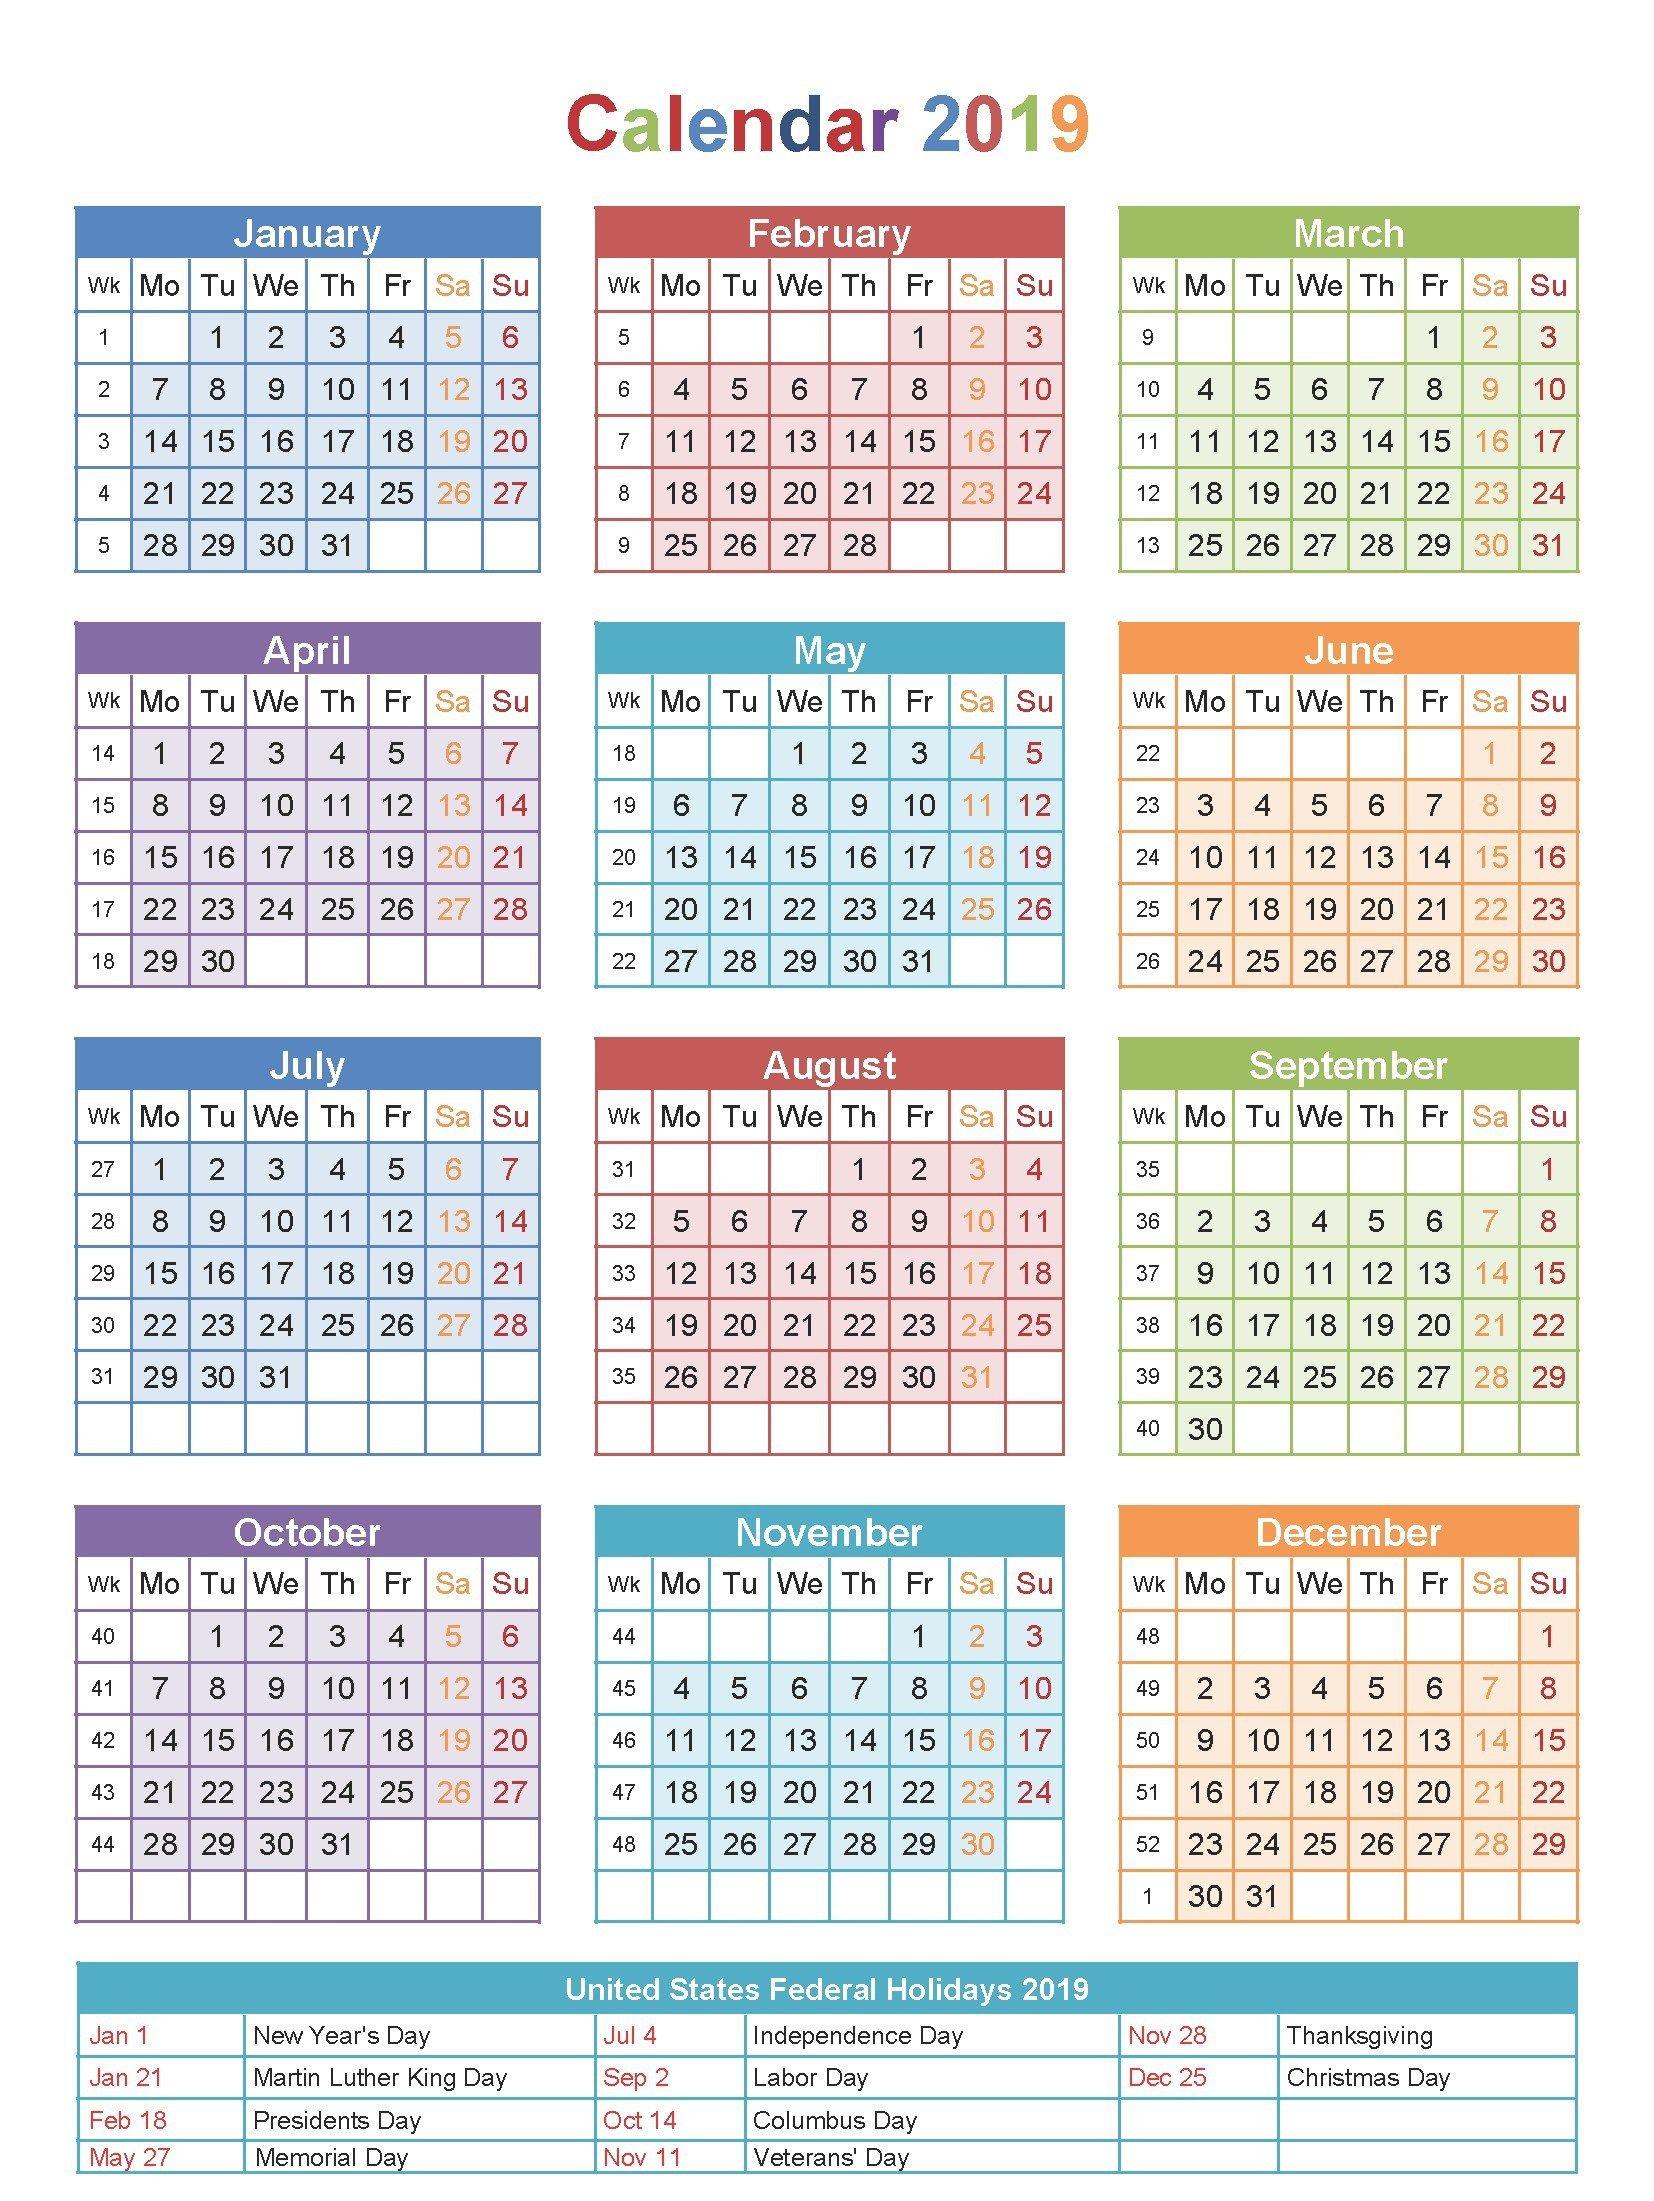 Free Editable Usa 2019 Calendar Pdf, Excel, Word Templates | Govind for Calendar With Holidays Templates